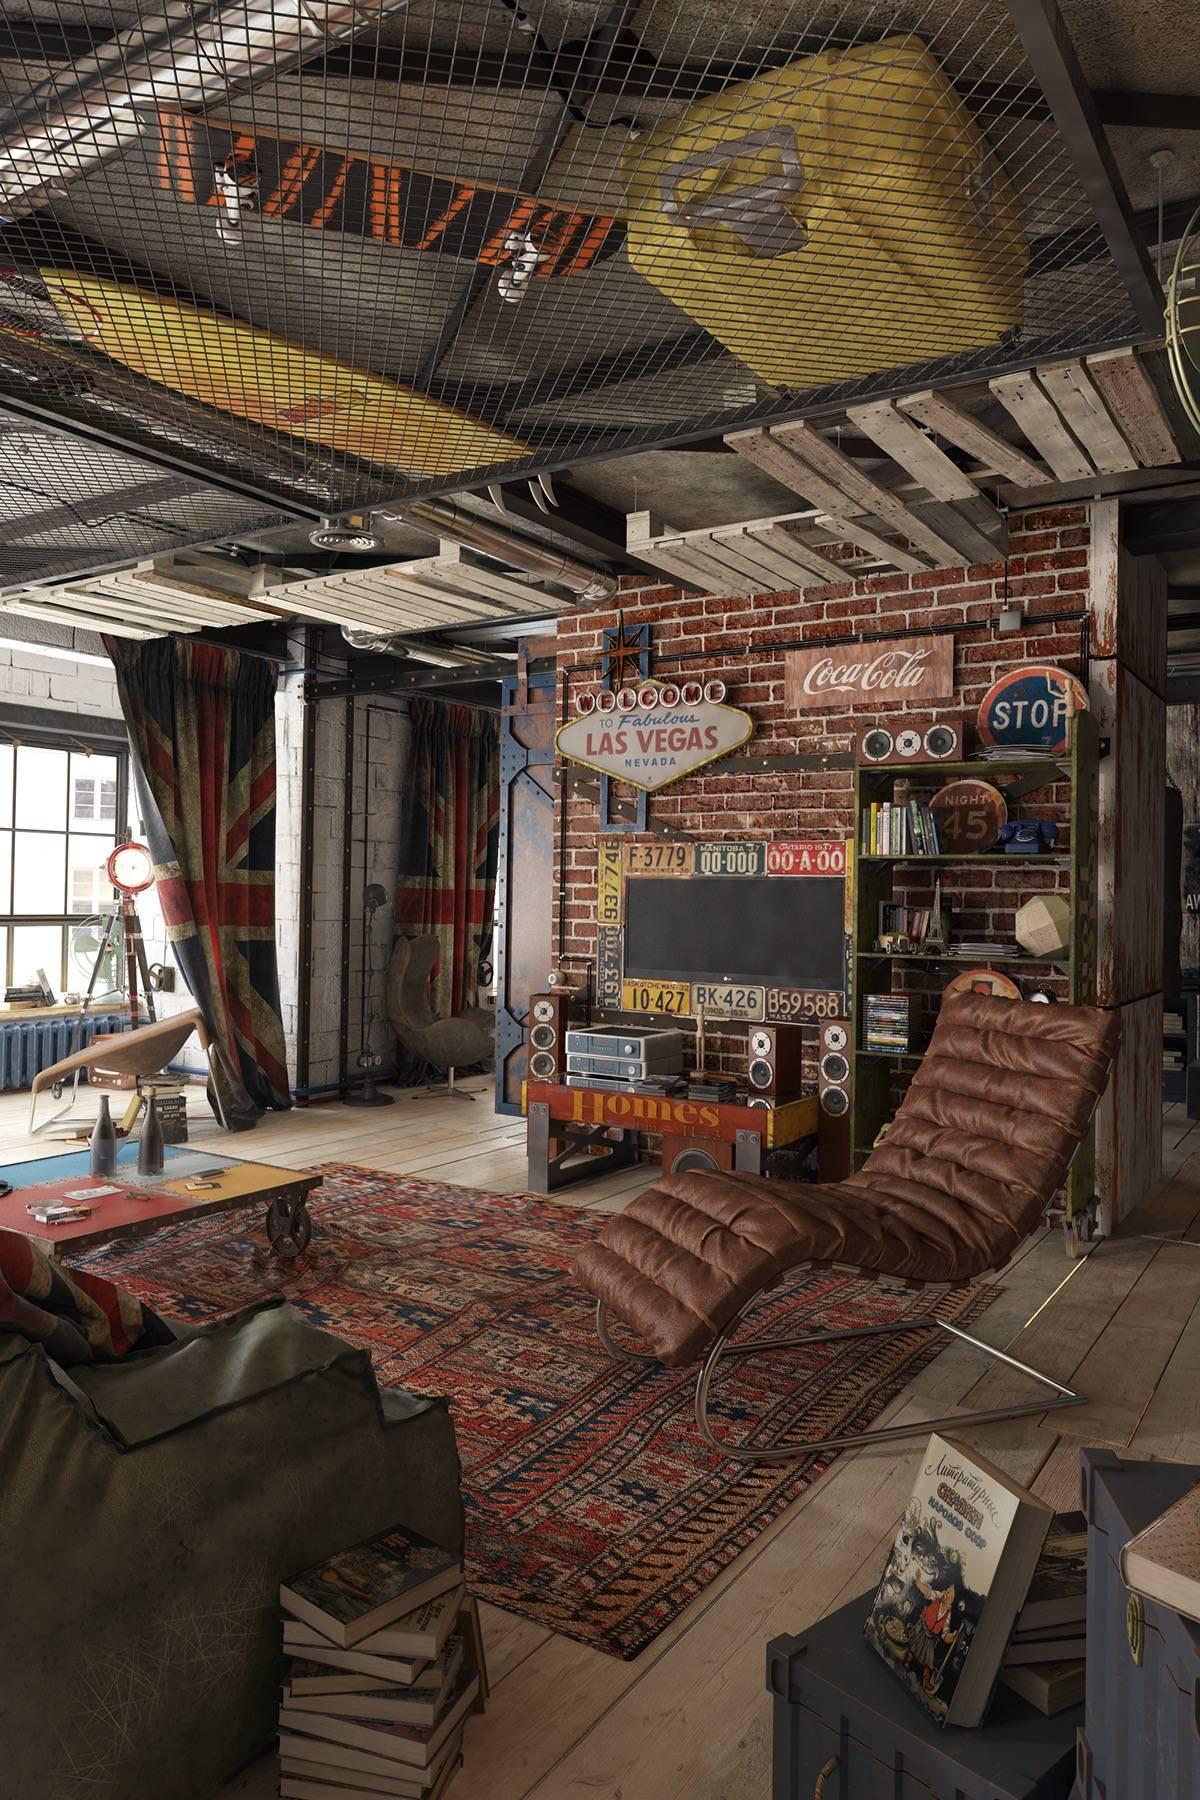 apartment loft decor ideas awesome 2 loft ideas for the creative artist of apartment loft decor ideas